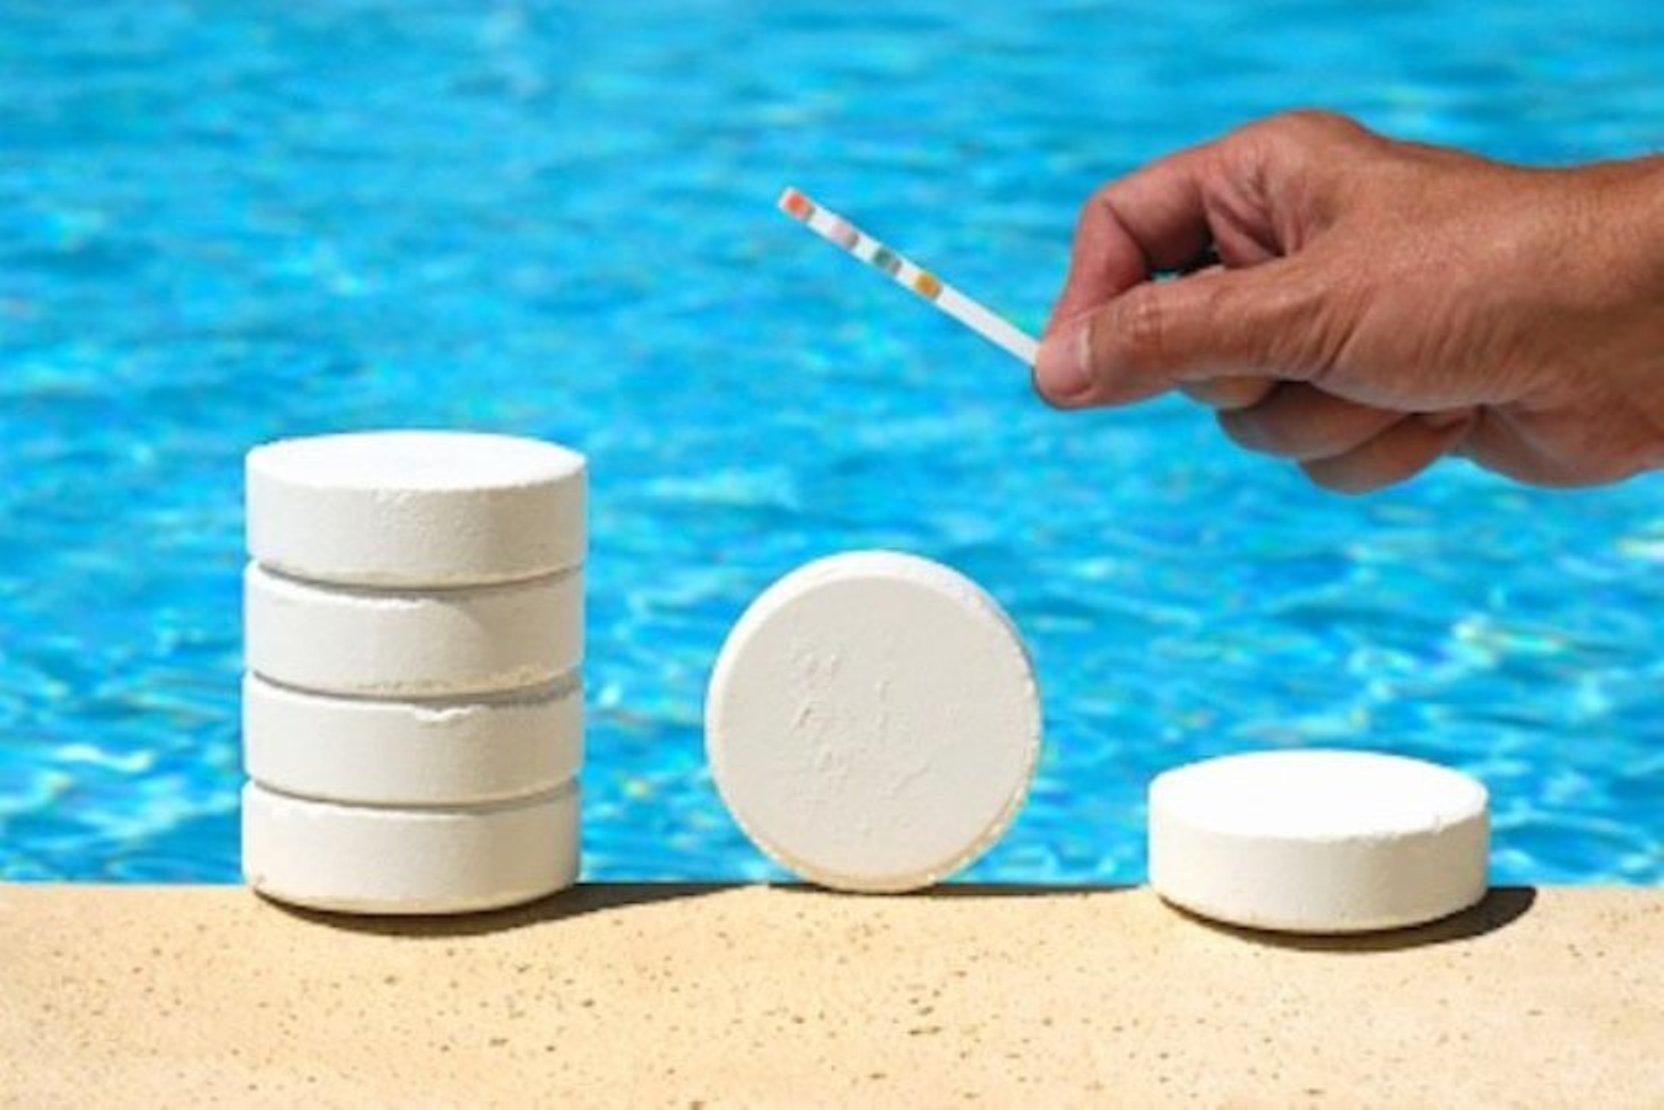 Хлор в таблетках на фоне бассейна